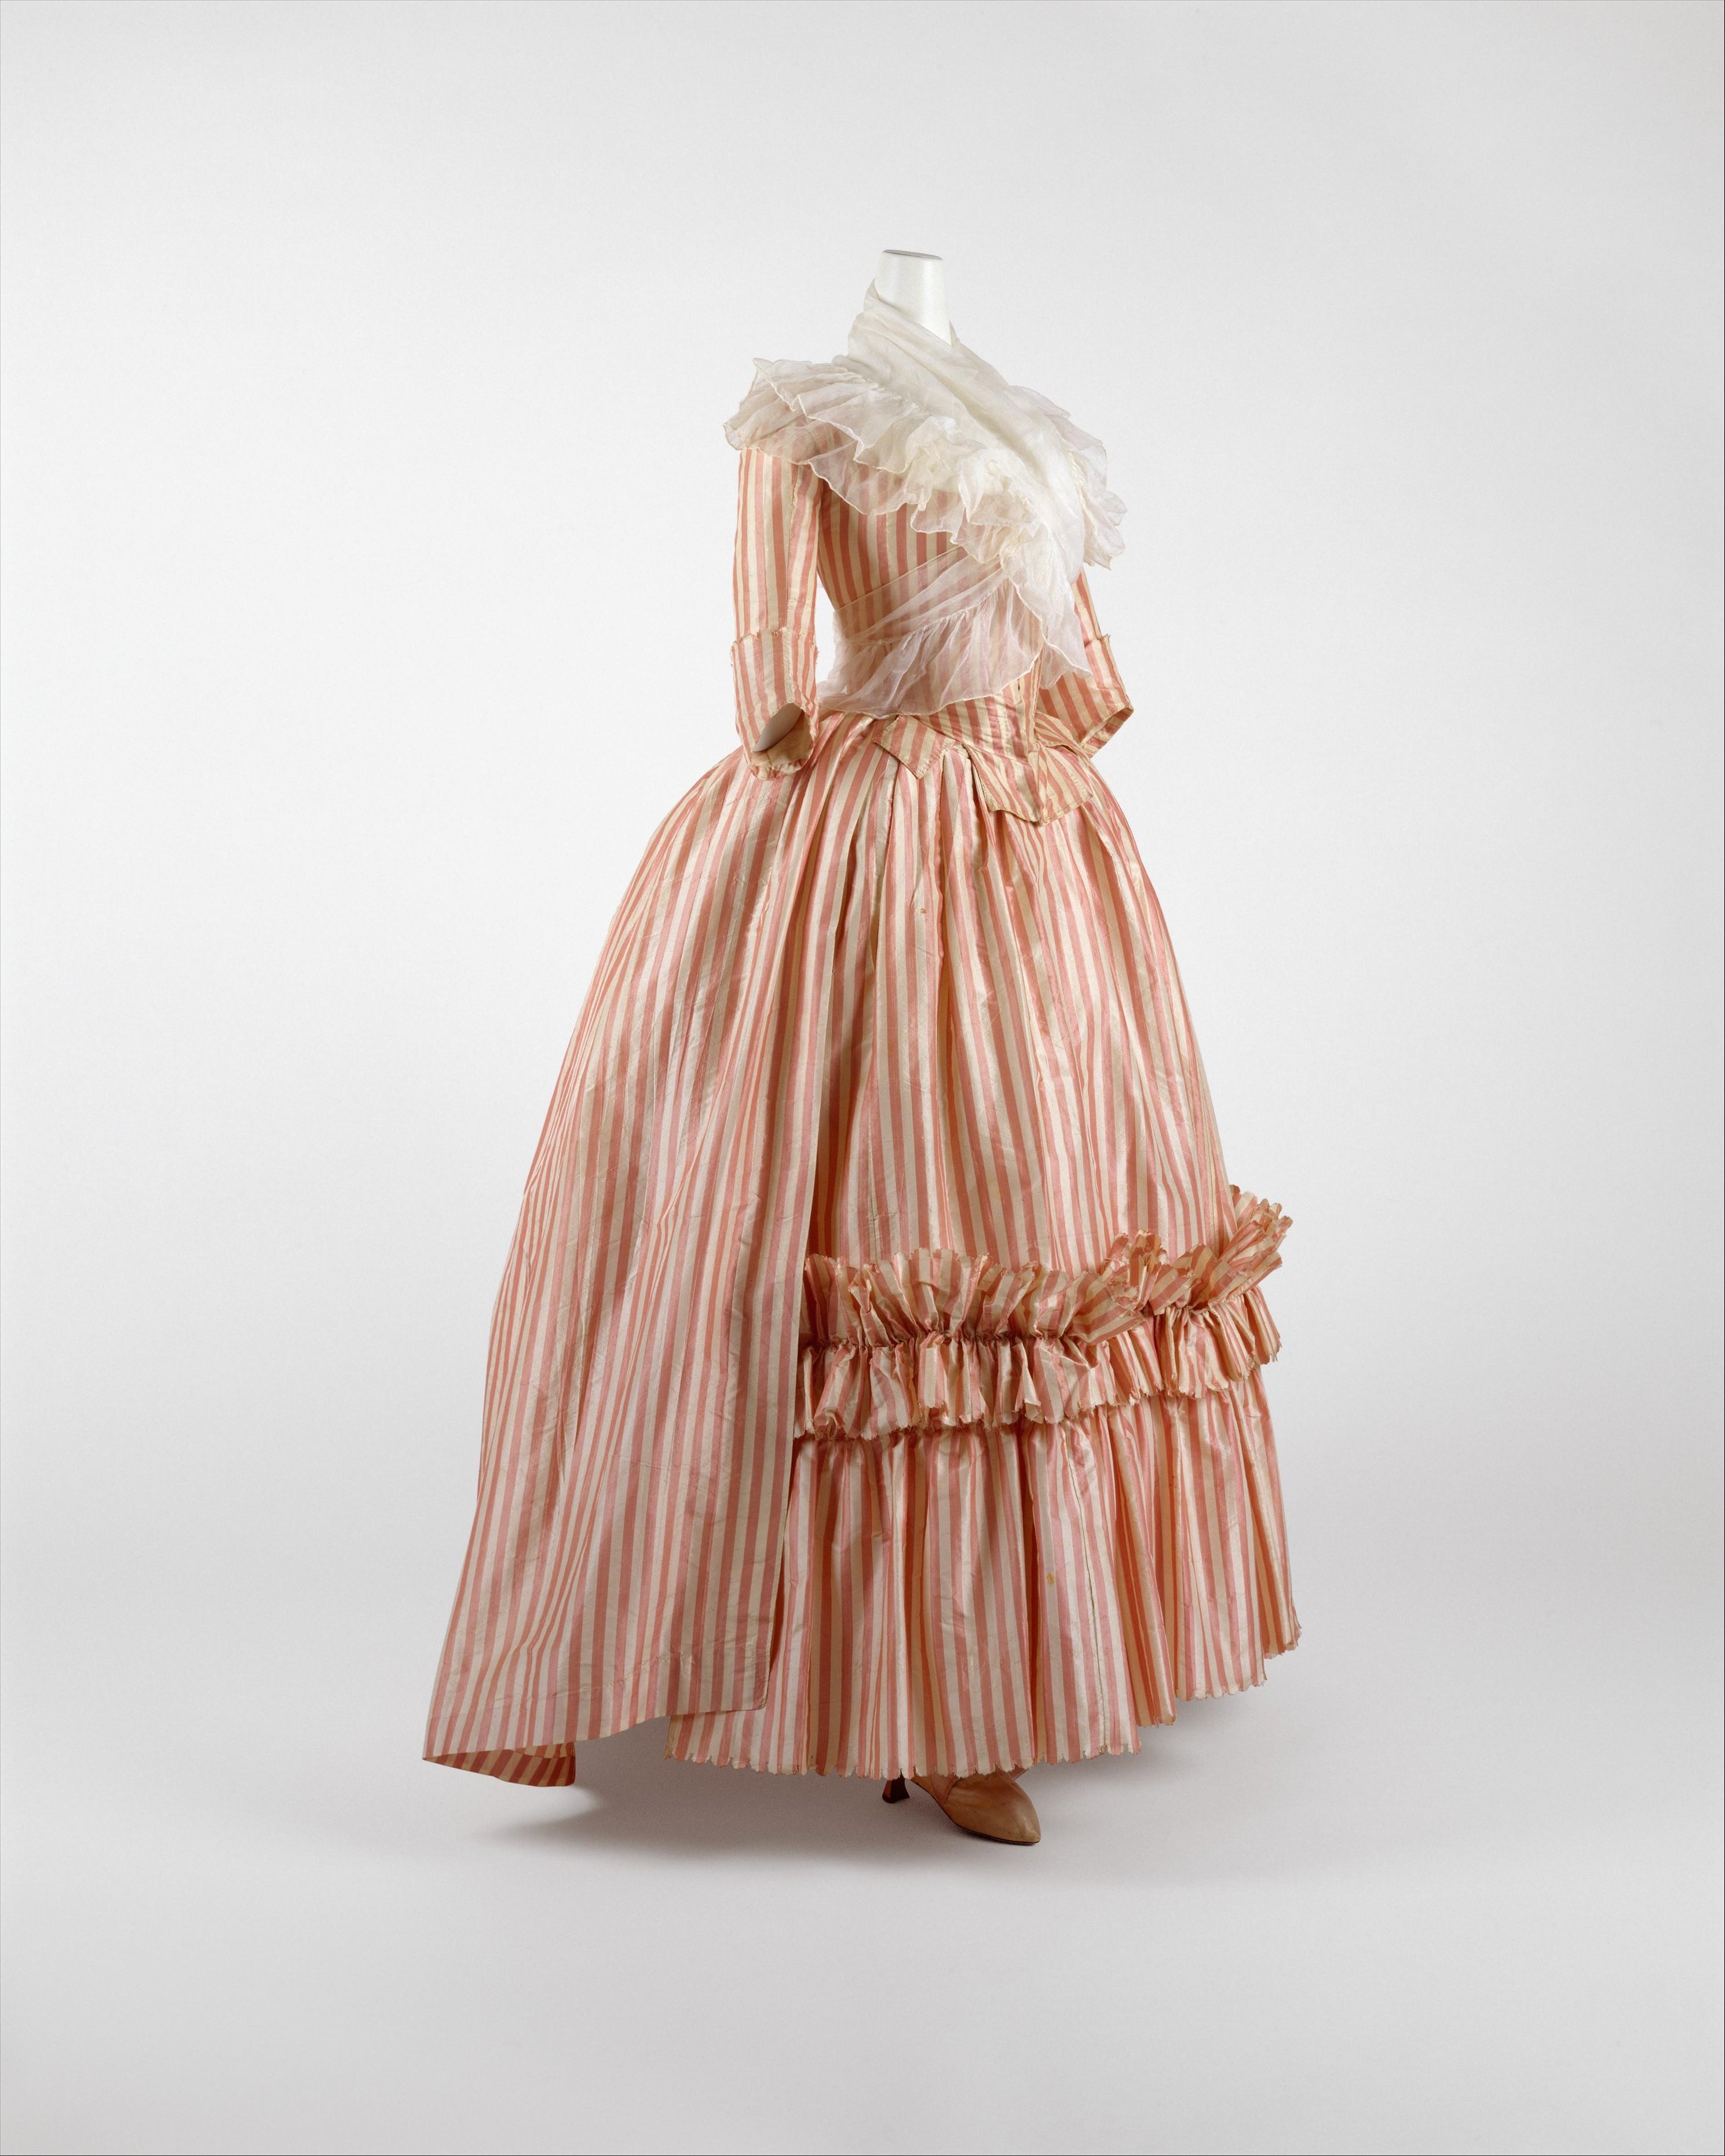 Robe A La Francaise: Robe à L'Anglaise, 1785–87